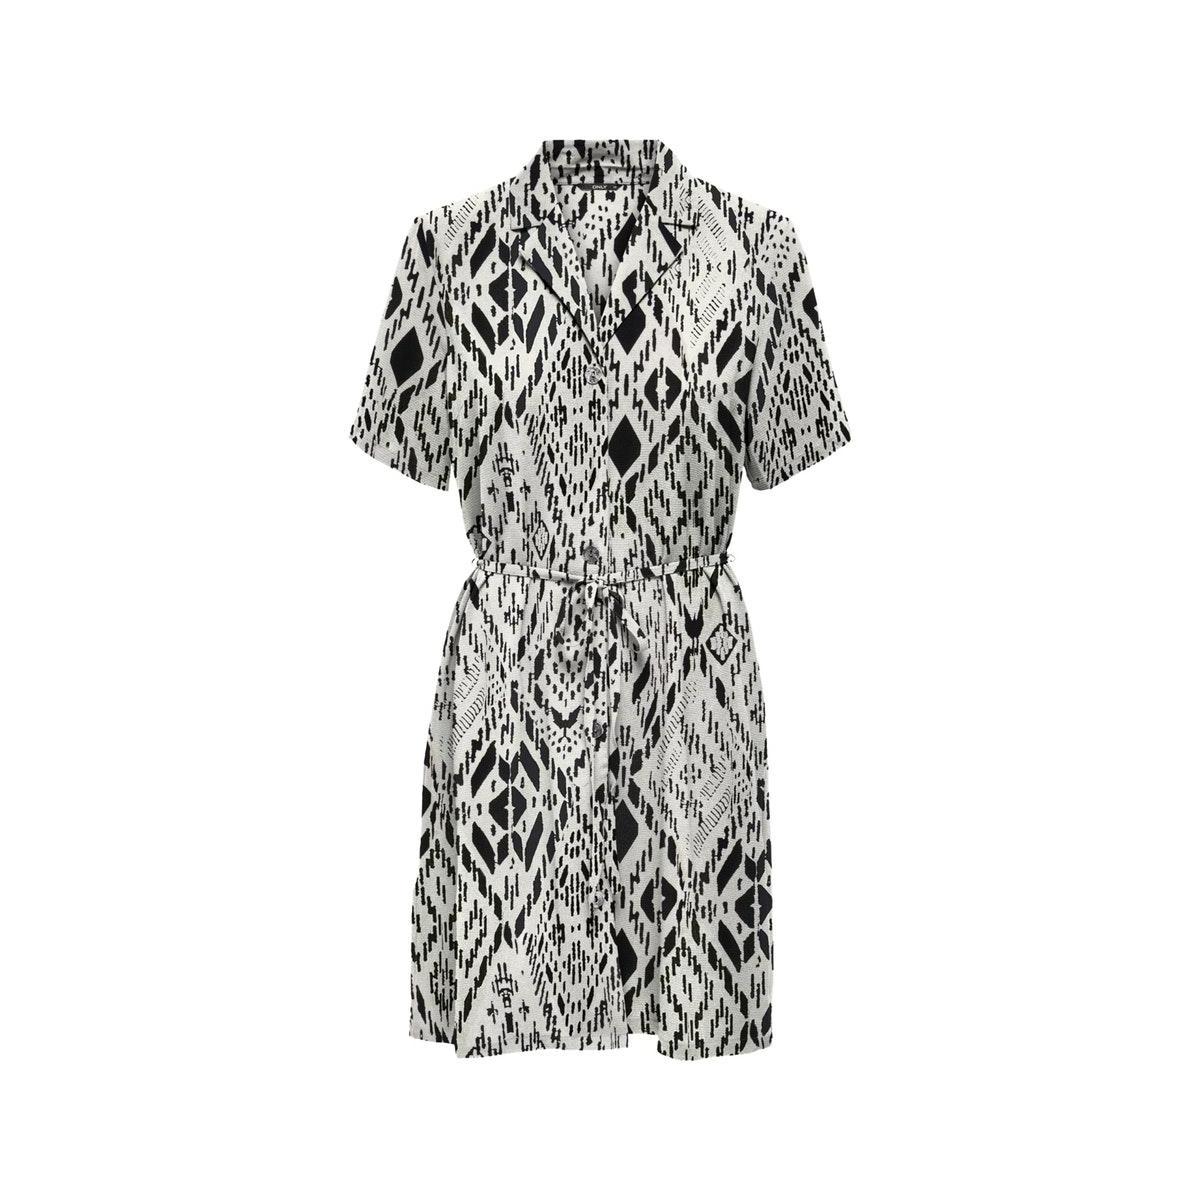 onlnova lux s/s button dress aop wv 15202530 only jurk cloud dancer/tribal